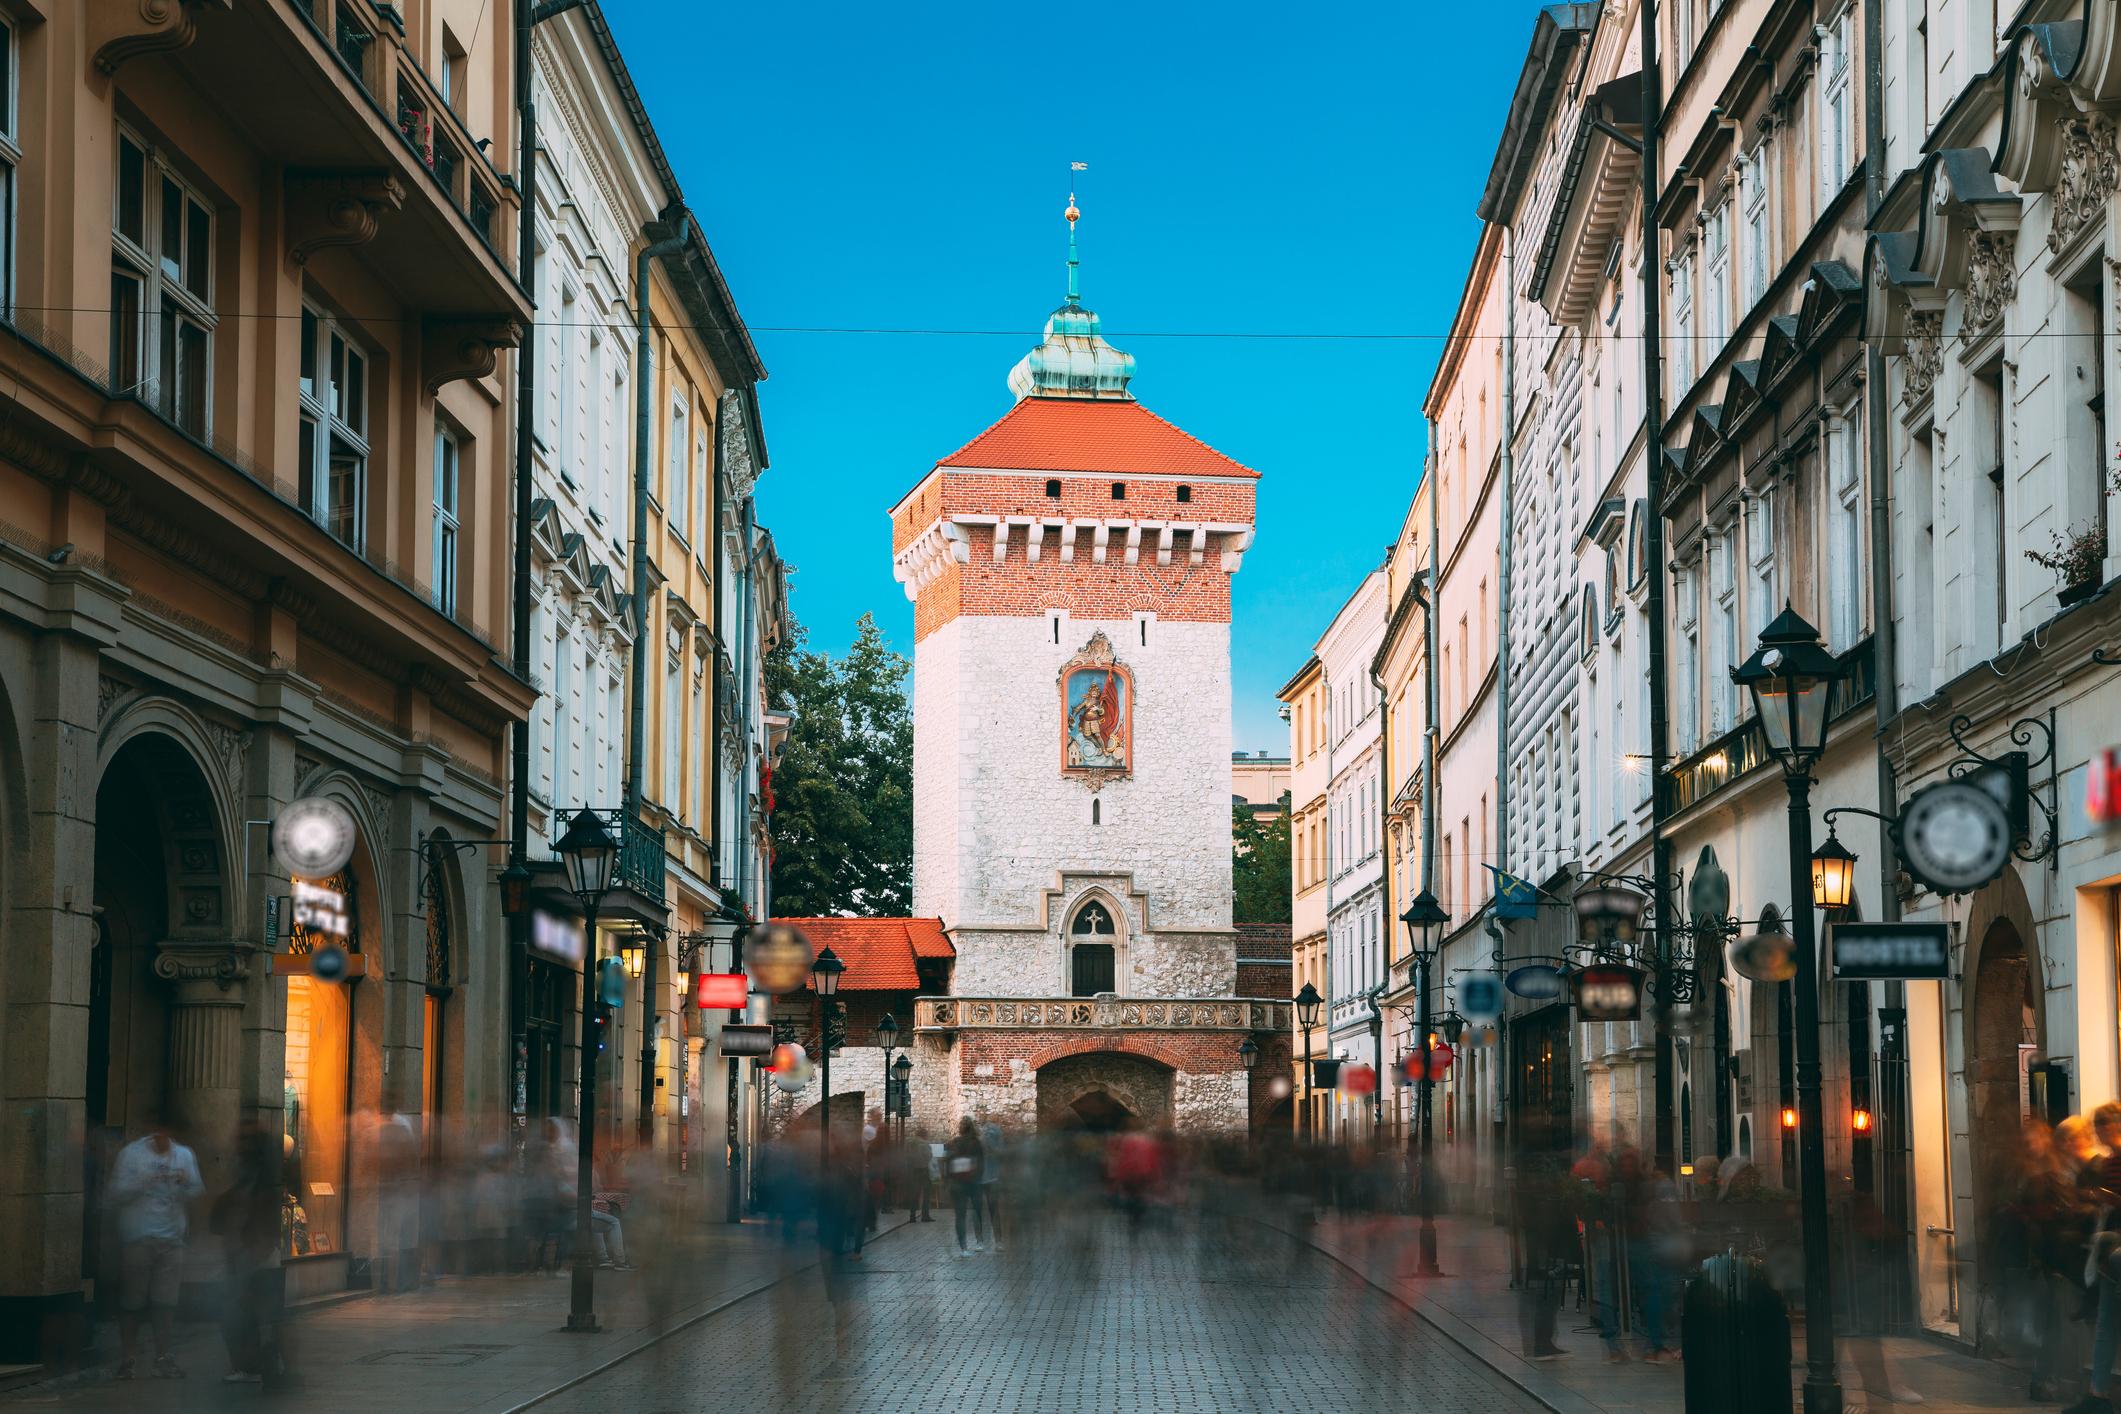 Krakow, Poland. Florianska Gate Krakow, the Medieval Florianska - St Florin's. UNESCO World Heritage Site. (iStock)